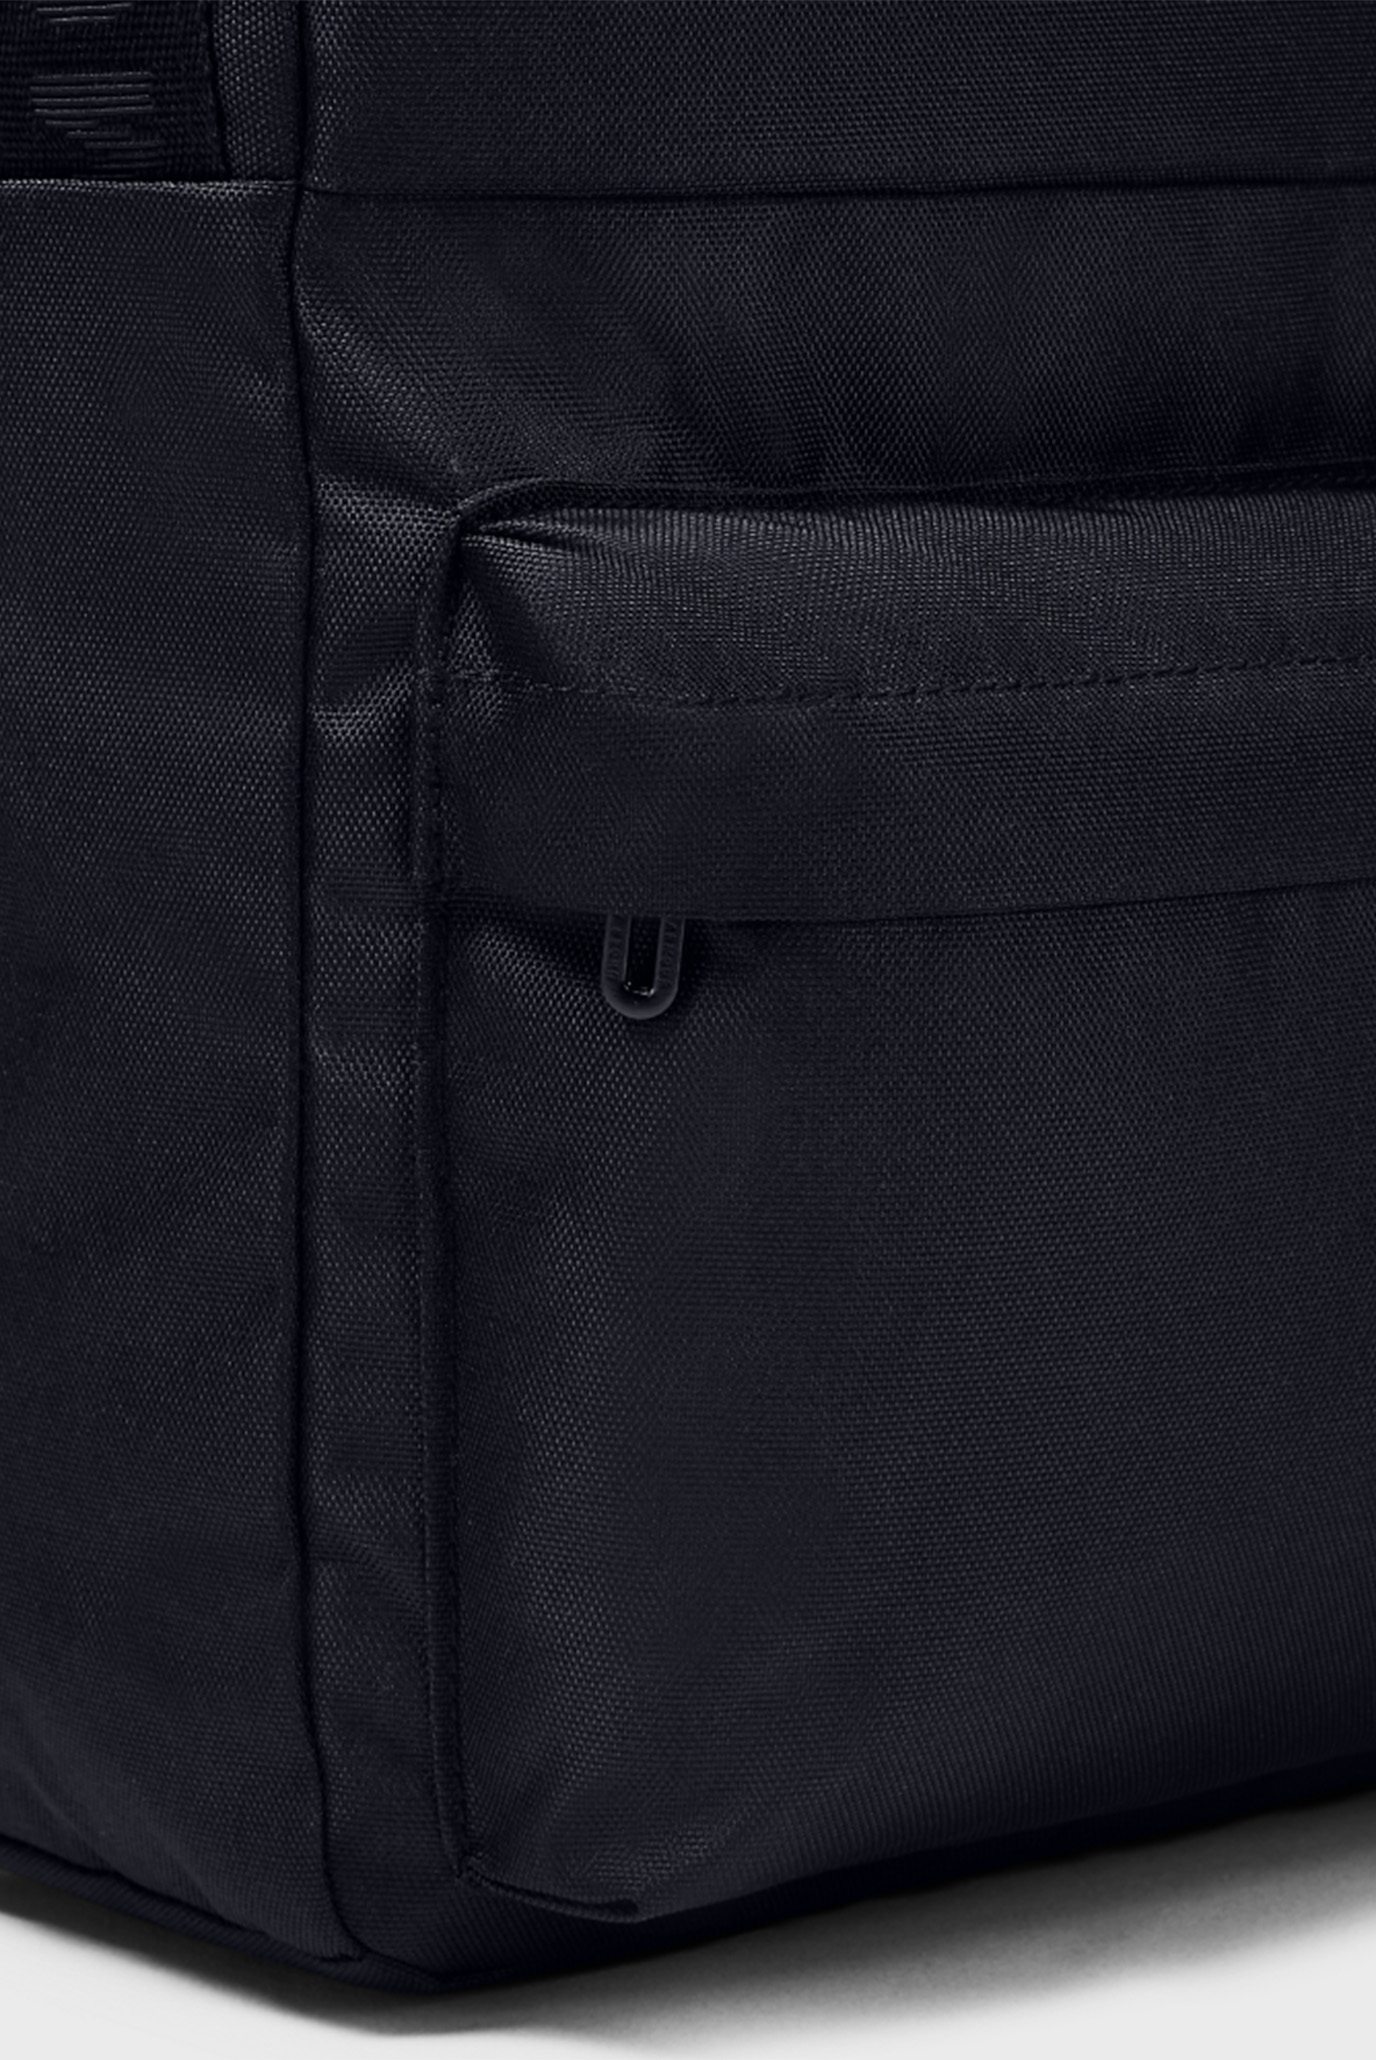 Черный рюкзак UA Loudon Backpack-BLK Under Armour